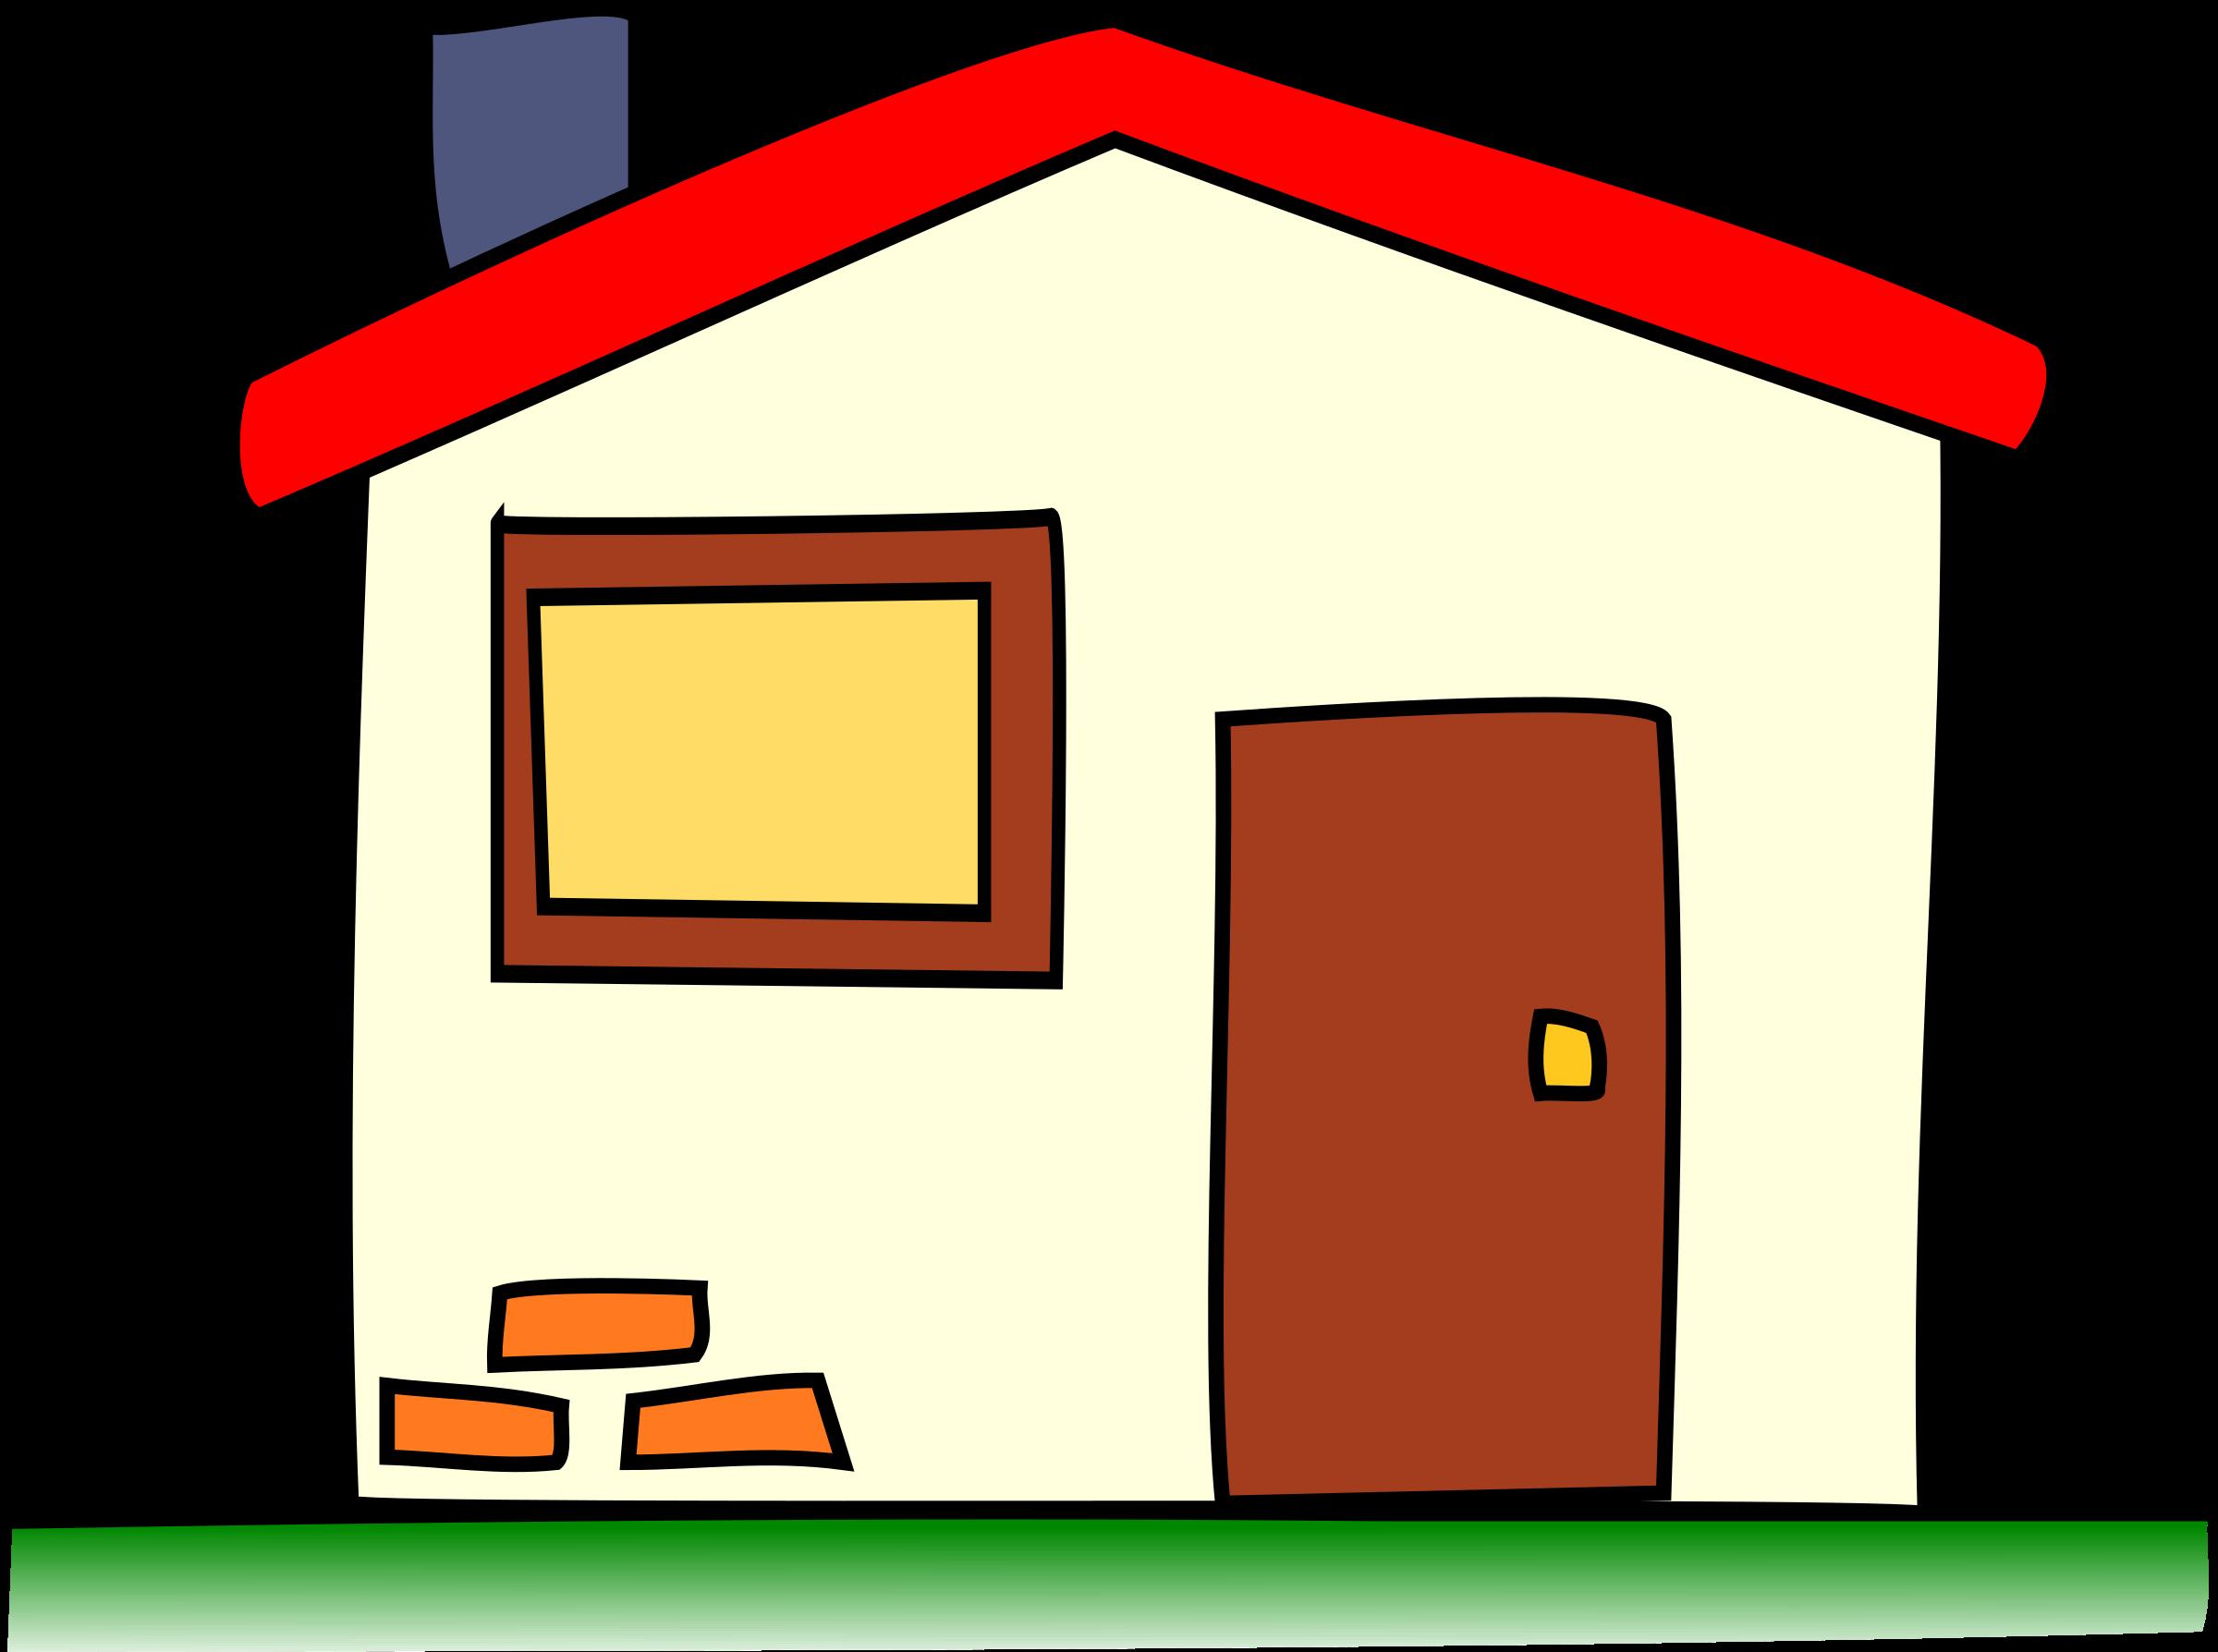 Vivienda clipart clip stock Image Of A House | Free download best Image Of A House on ... clip stock